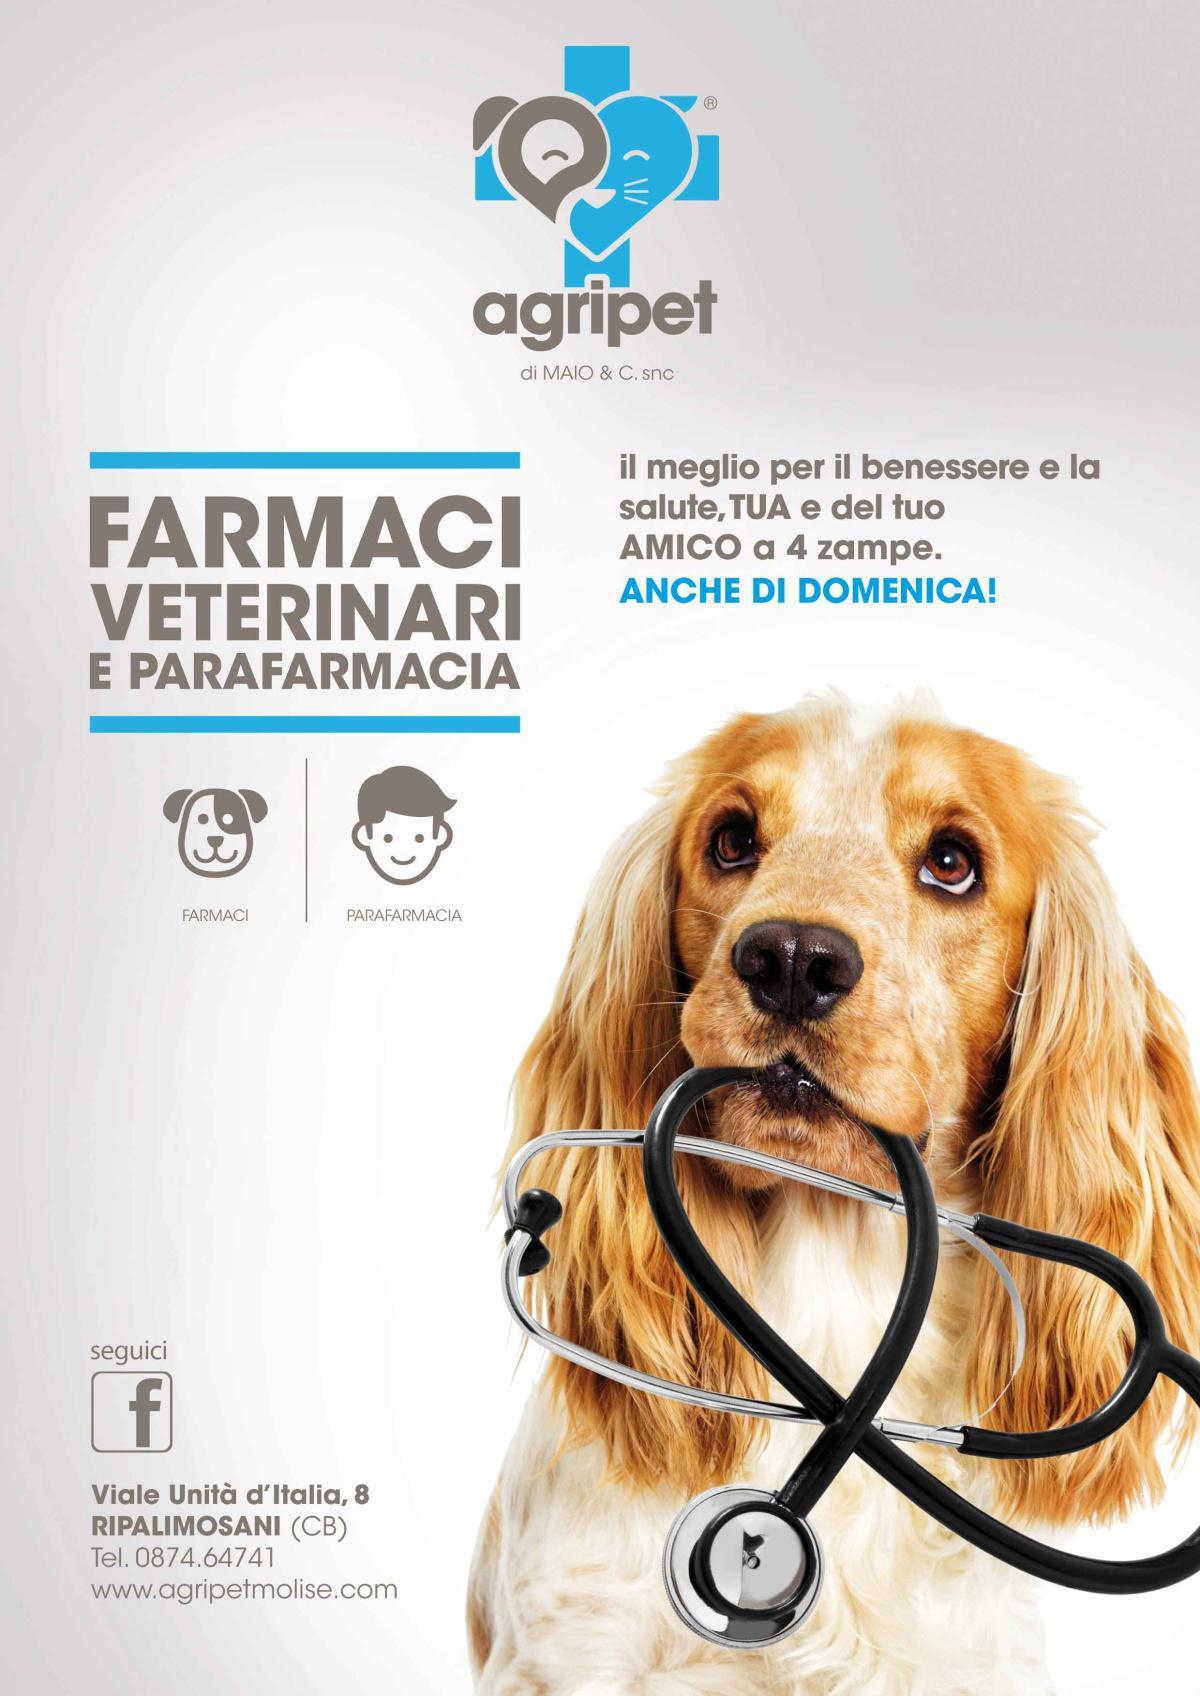 Farmaci Veterinari Parafarmacia